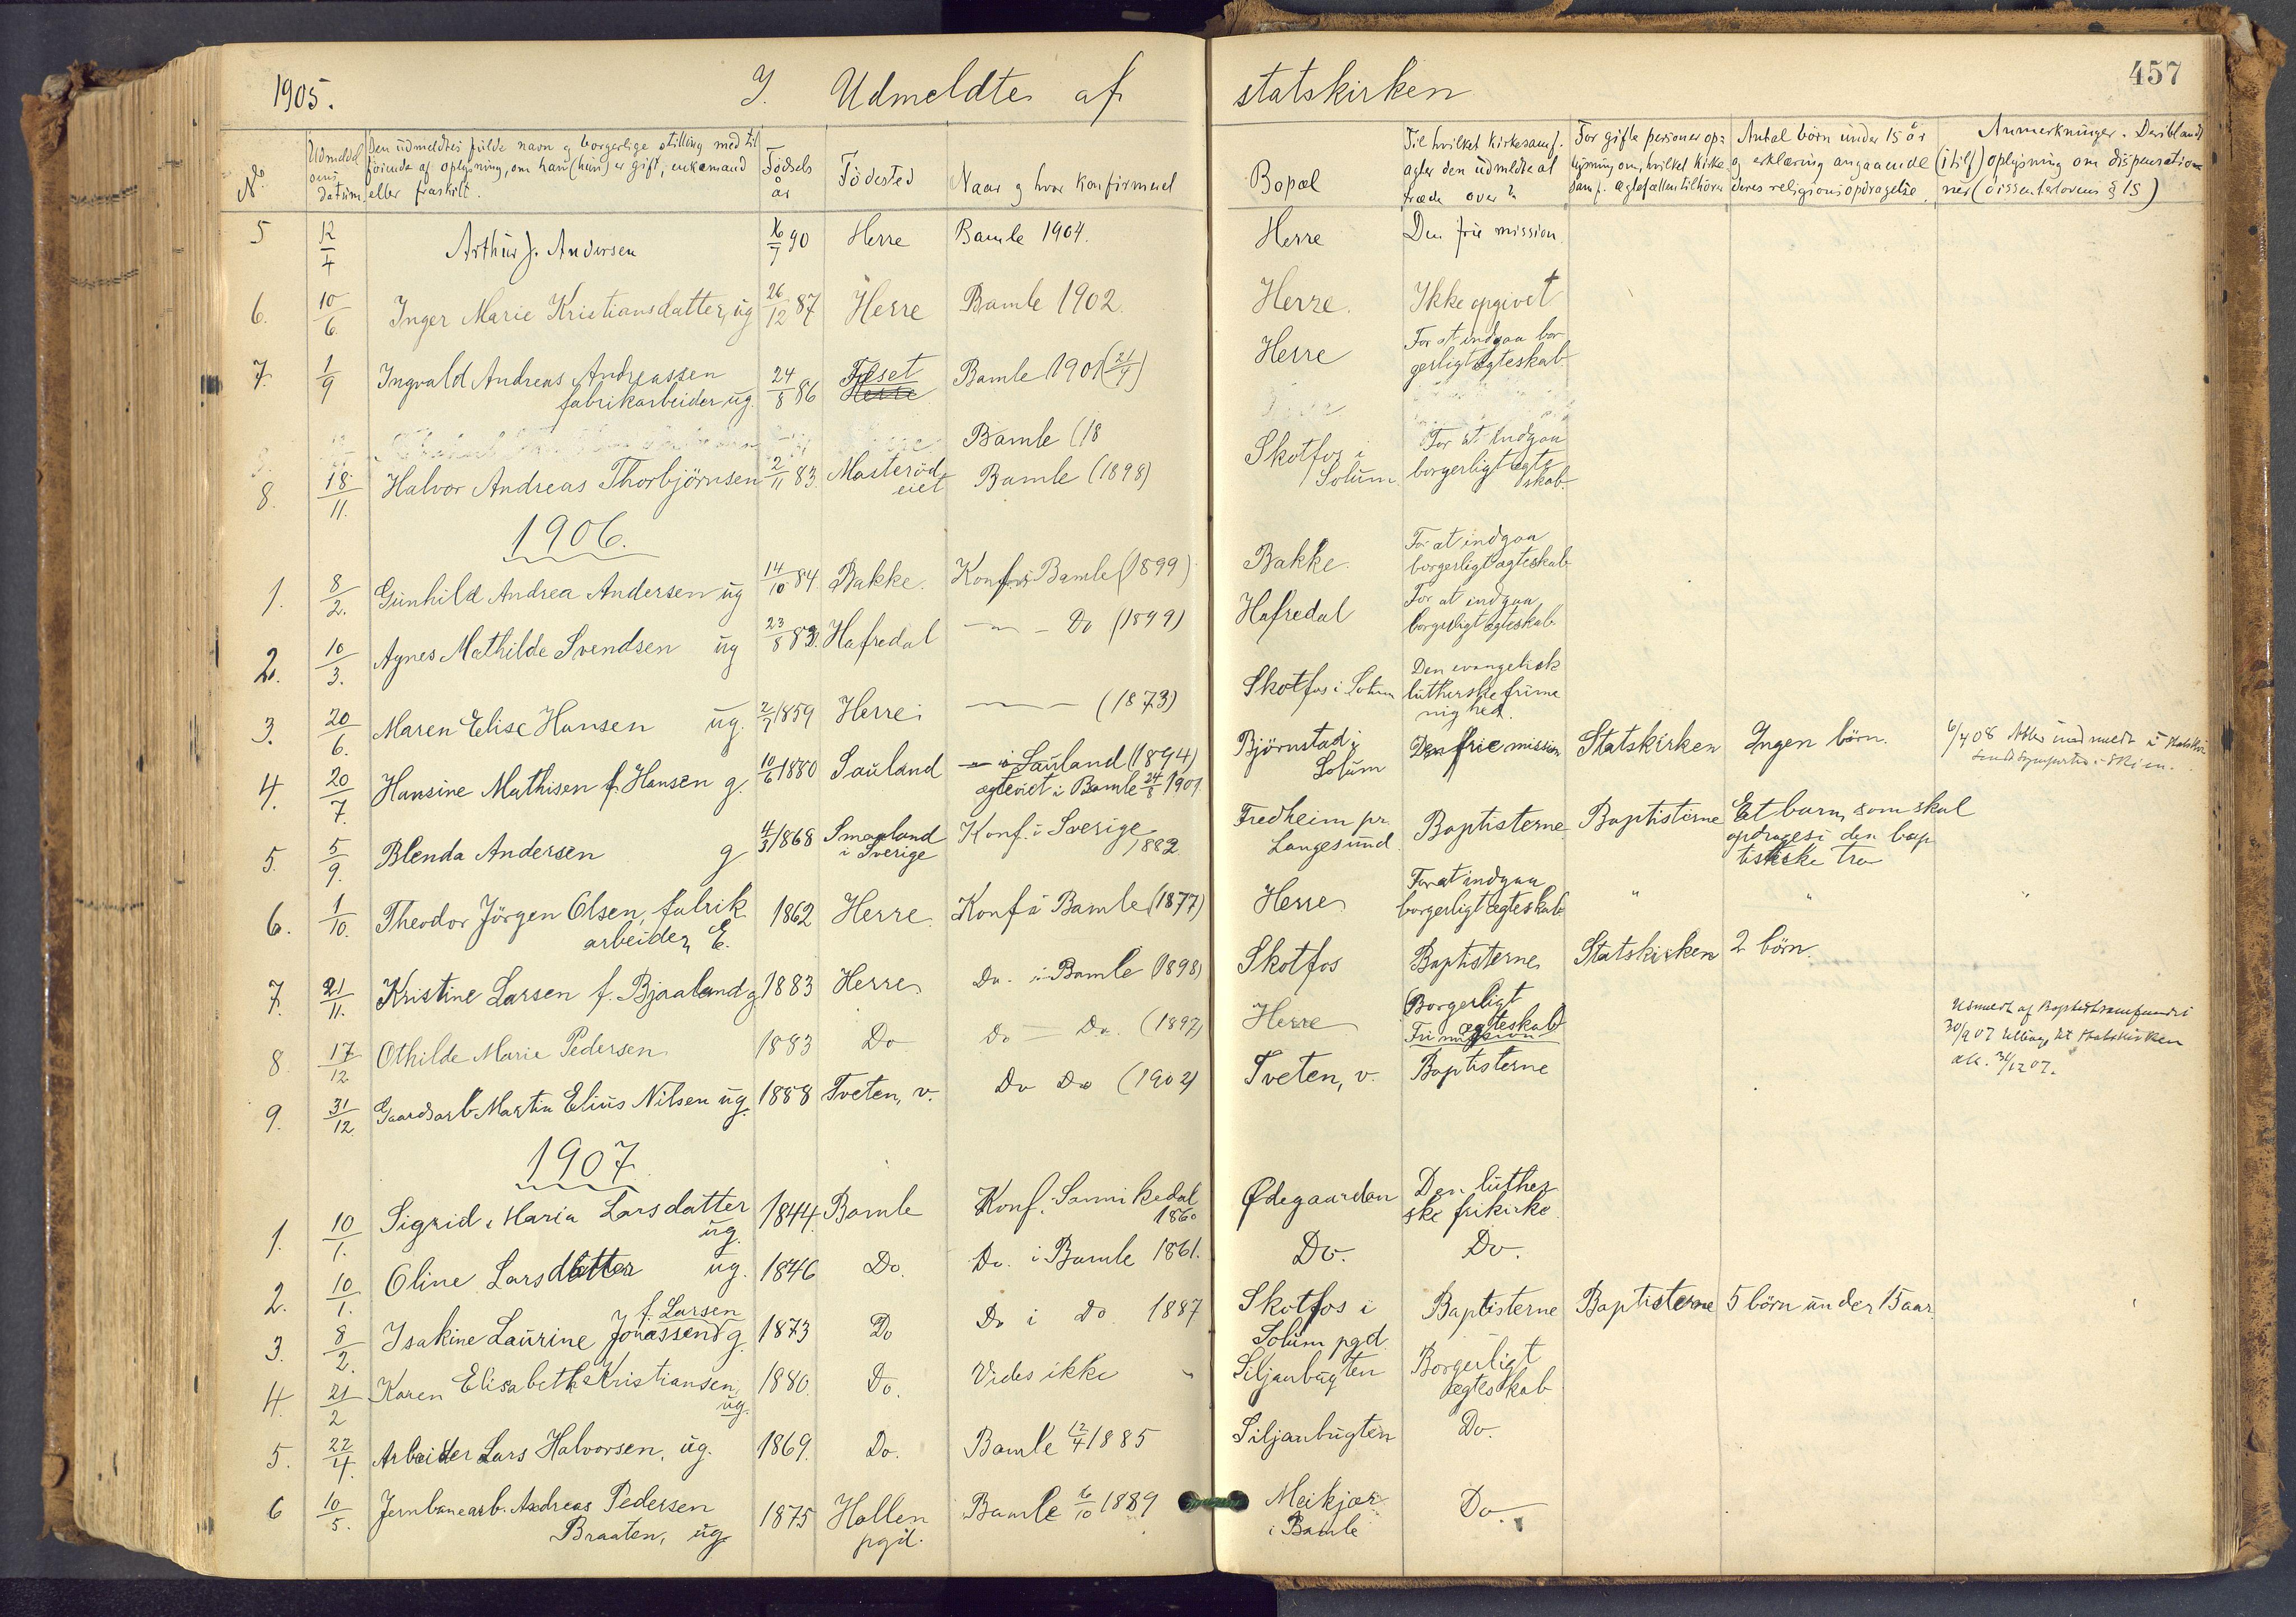 SAKO, Bamble kirkebøker, F/Fa/L0009: Ministerialbok nr. I 9, 1901-1917, s. 457